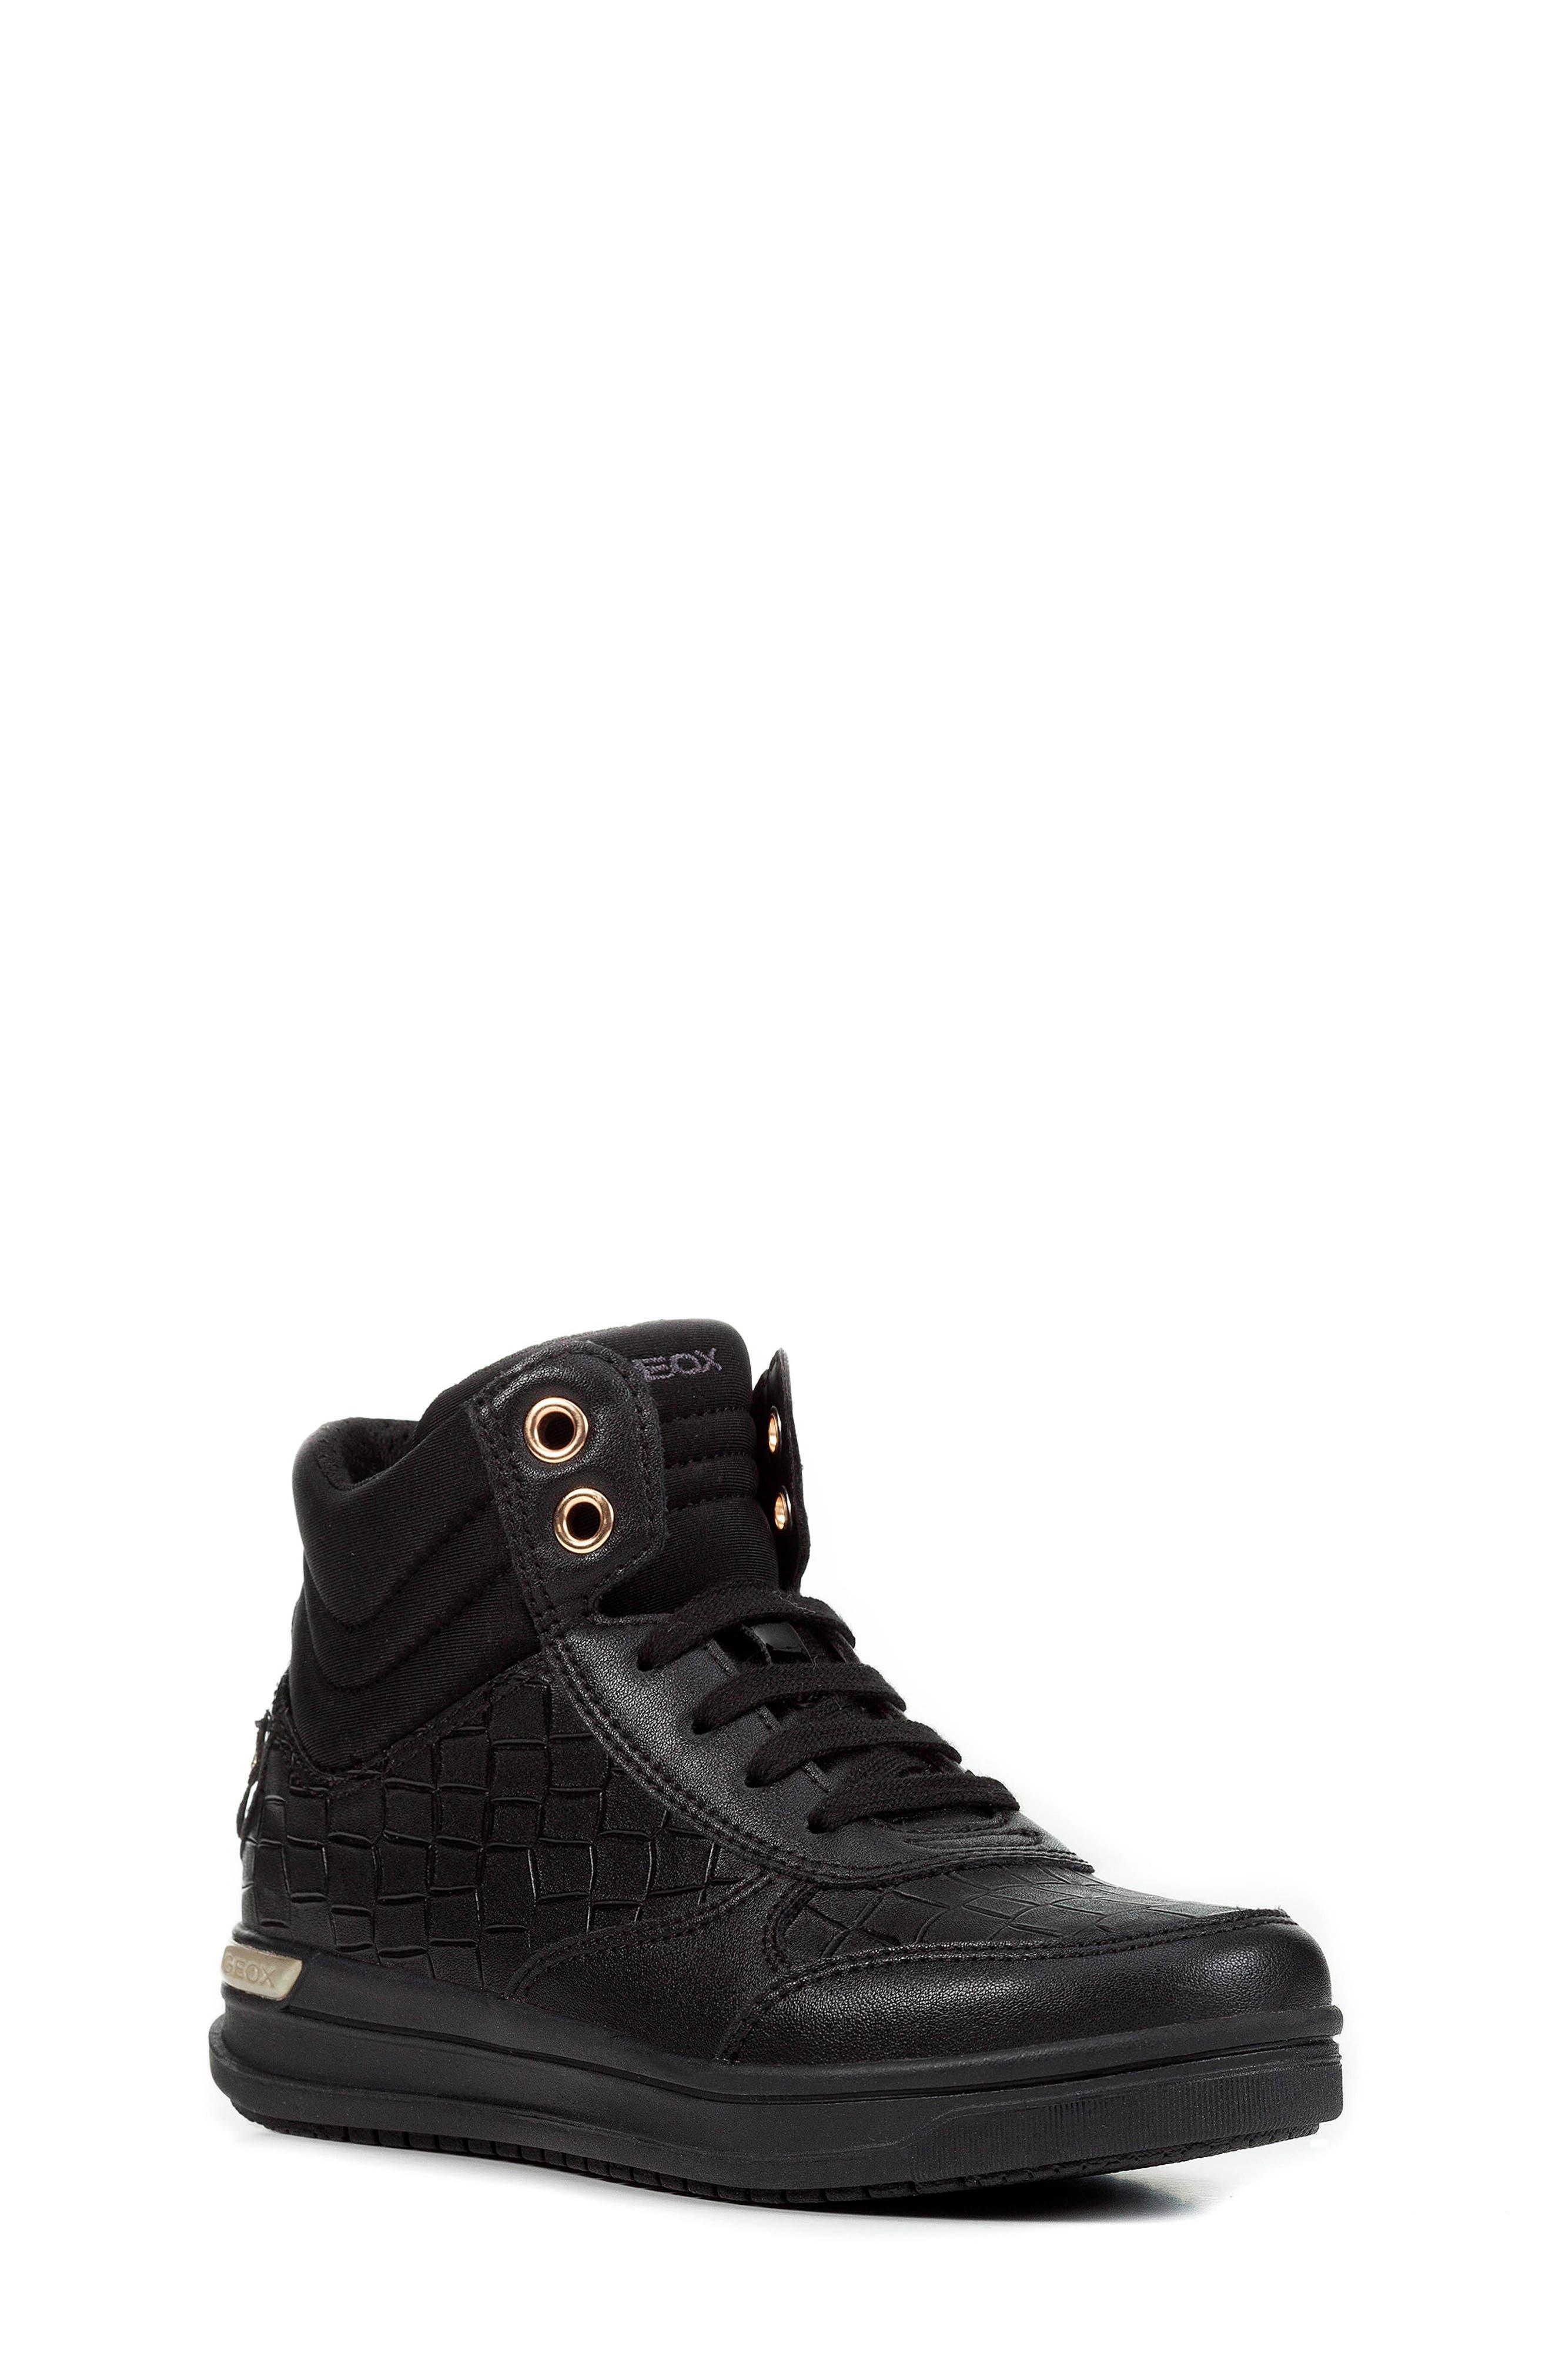 Aveup High Top Sneaker,                             Main thumbnail 1, color,                             BLACK